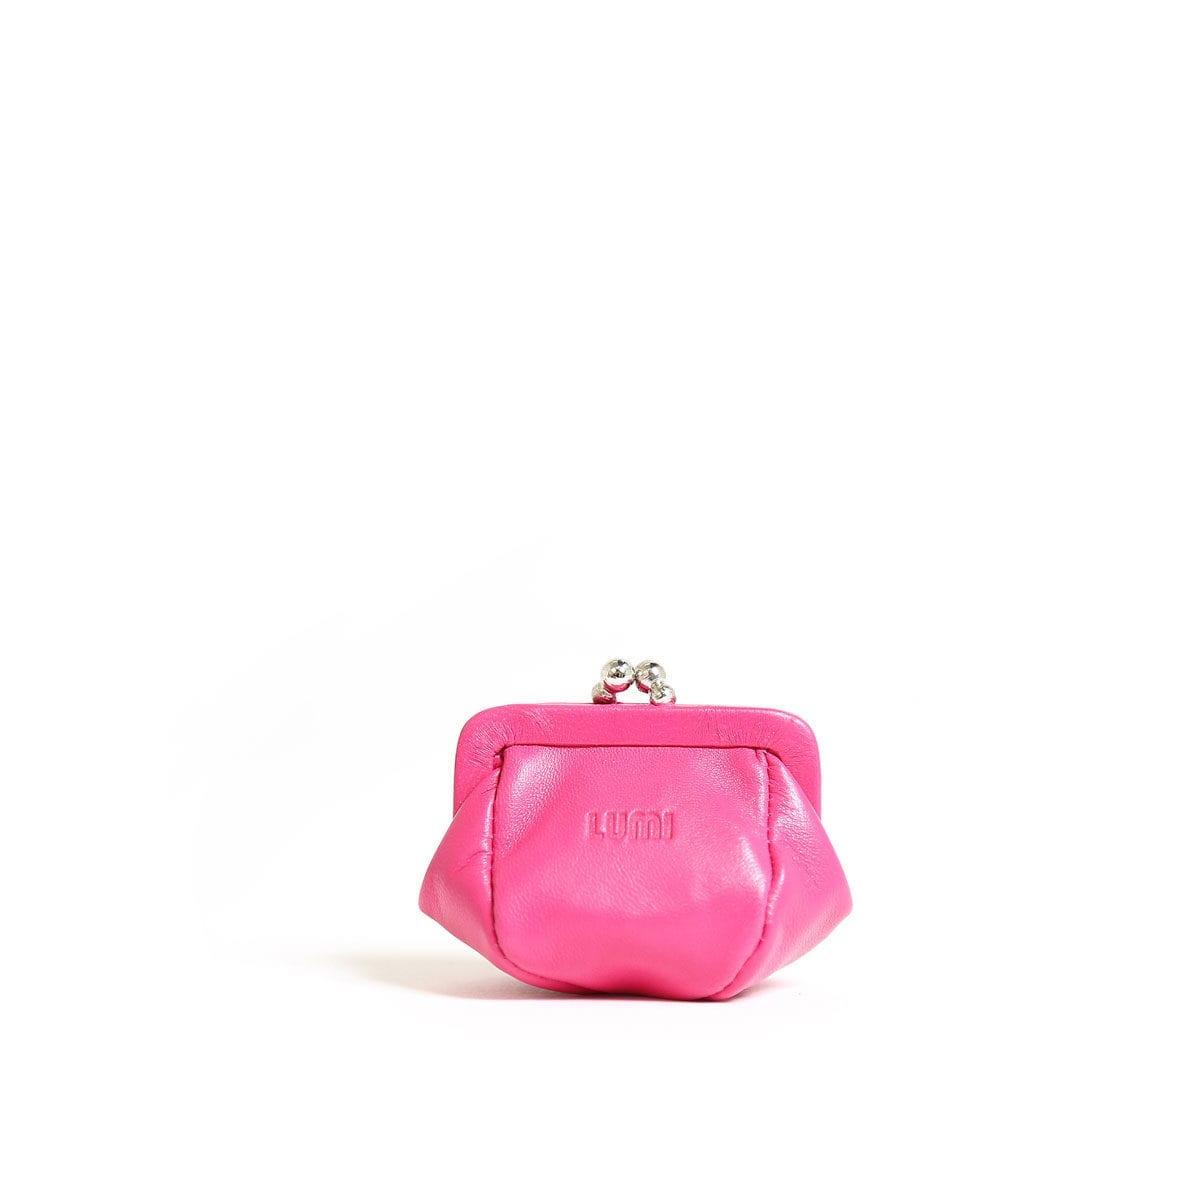 LUMI Aurora Jewellery Purse, in pink.